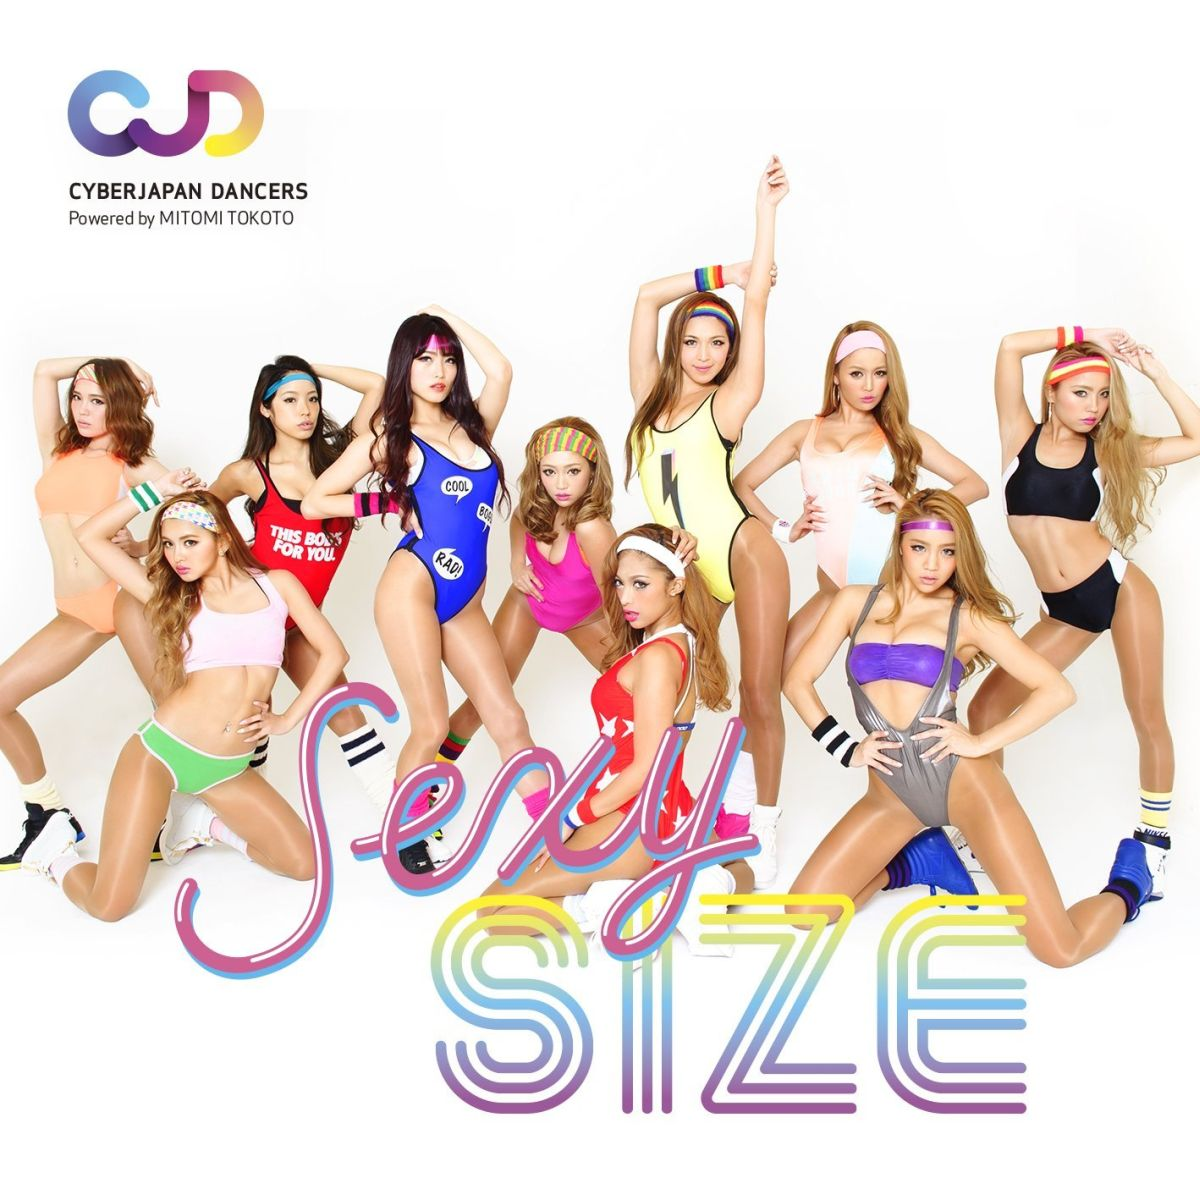 CYBERJAPAN DANCERSエクササイス 「SEXY SIZE」(セクシサイズ) [ CYBERJAPAN DANCERS ]